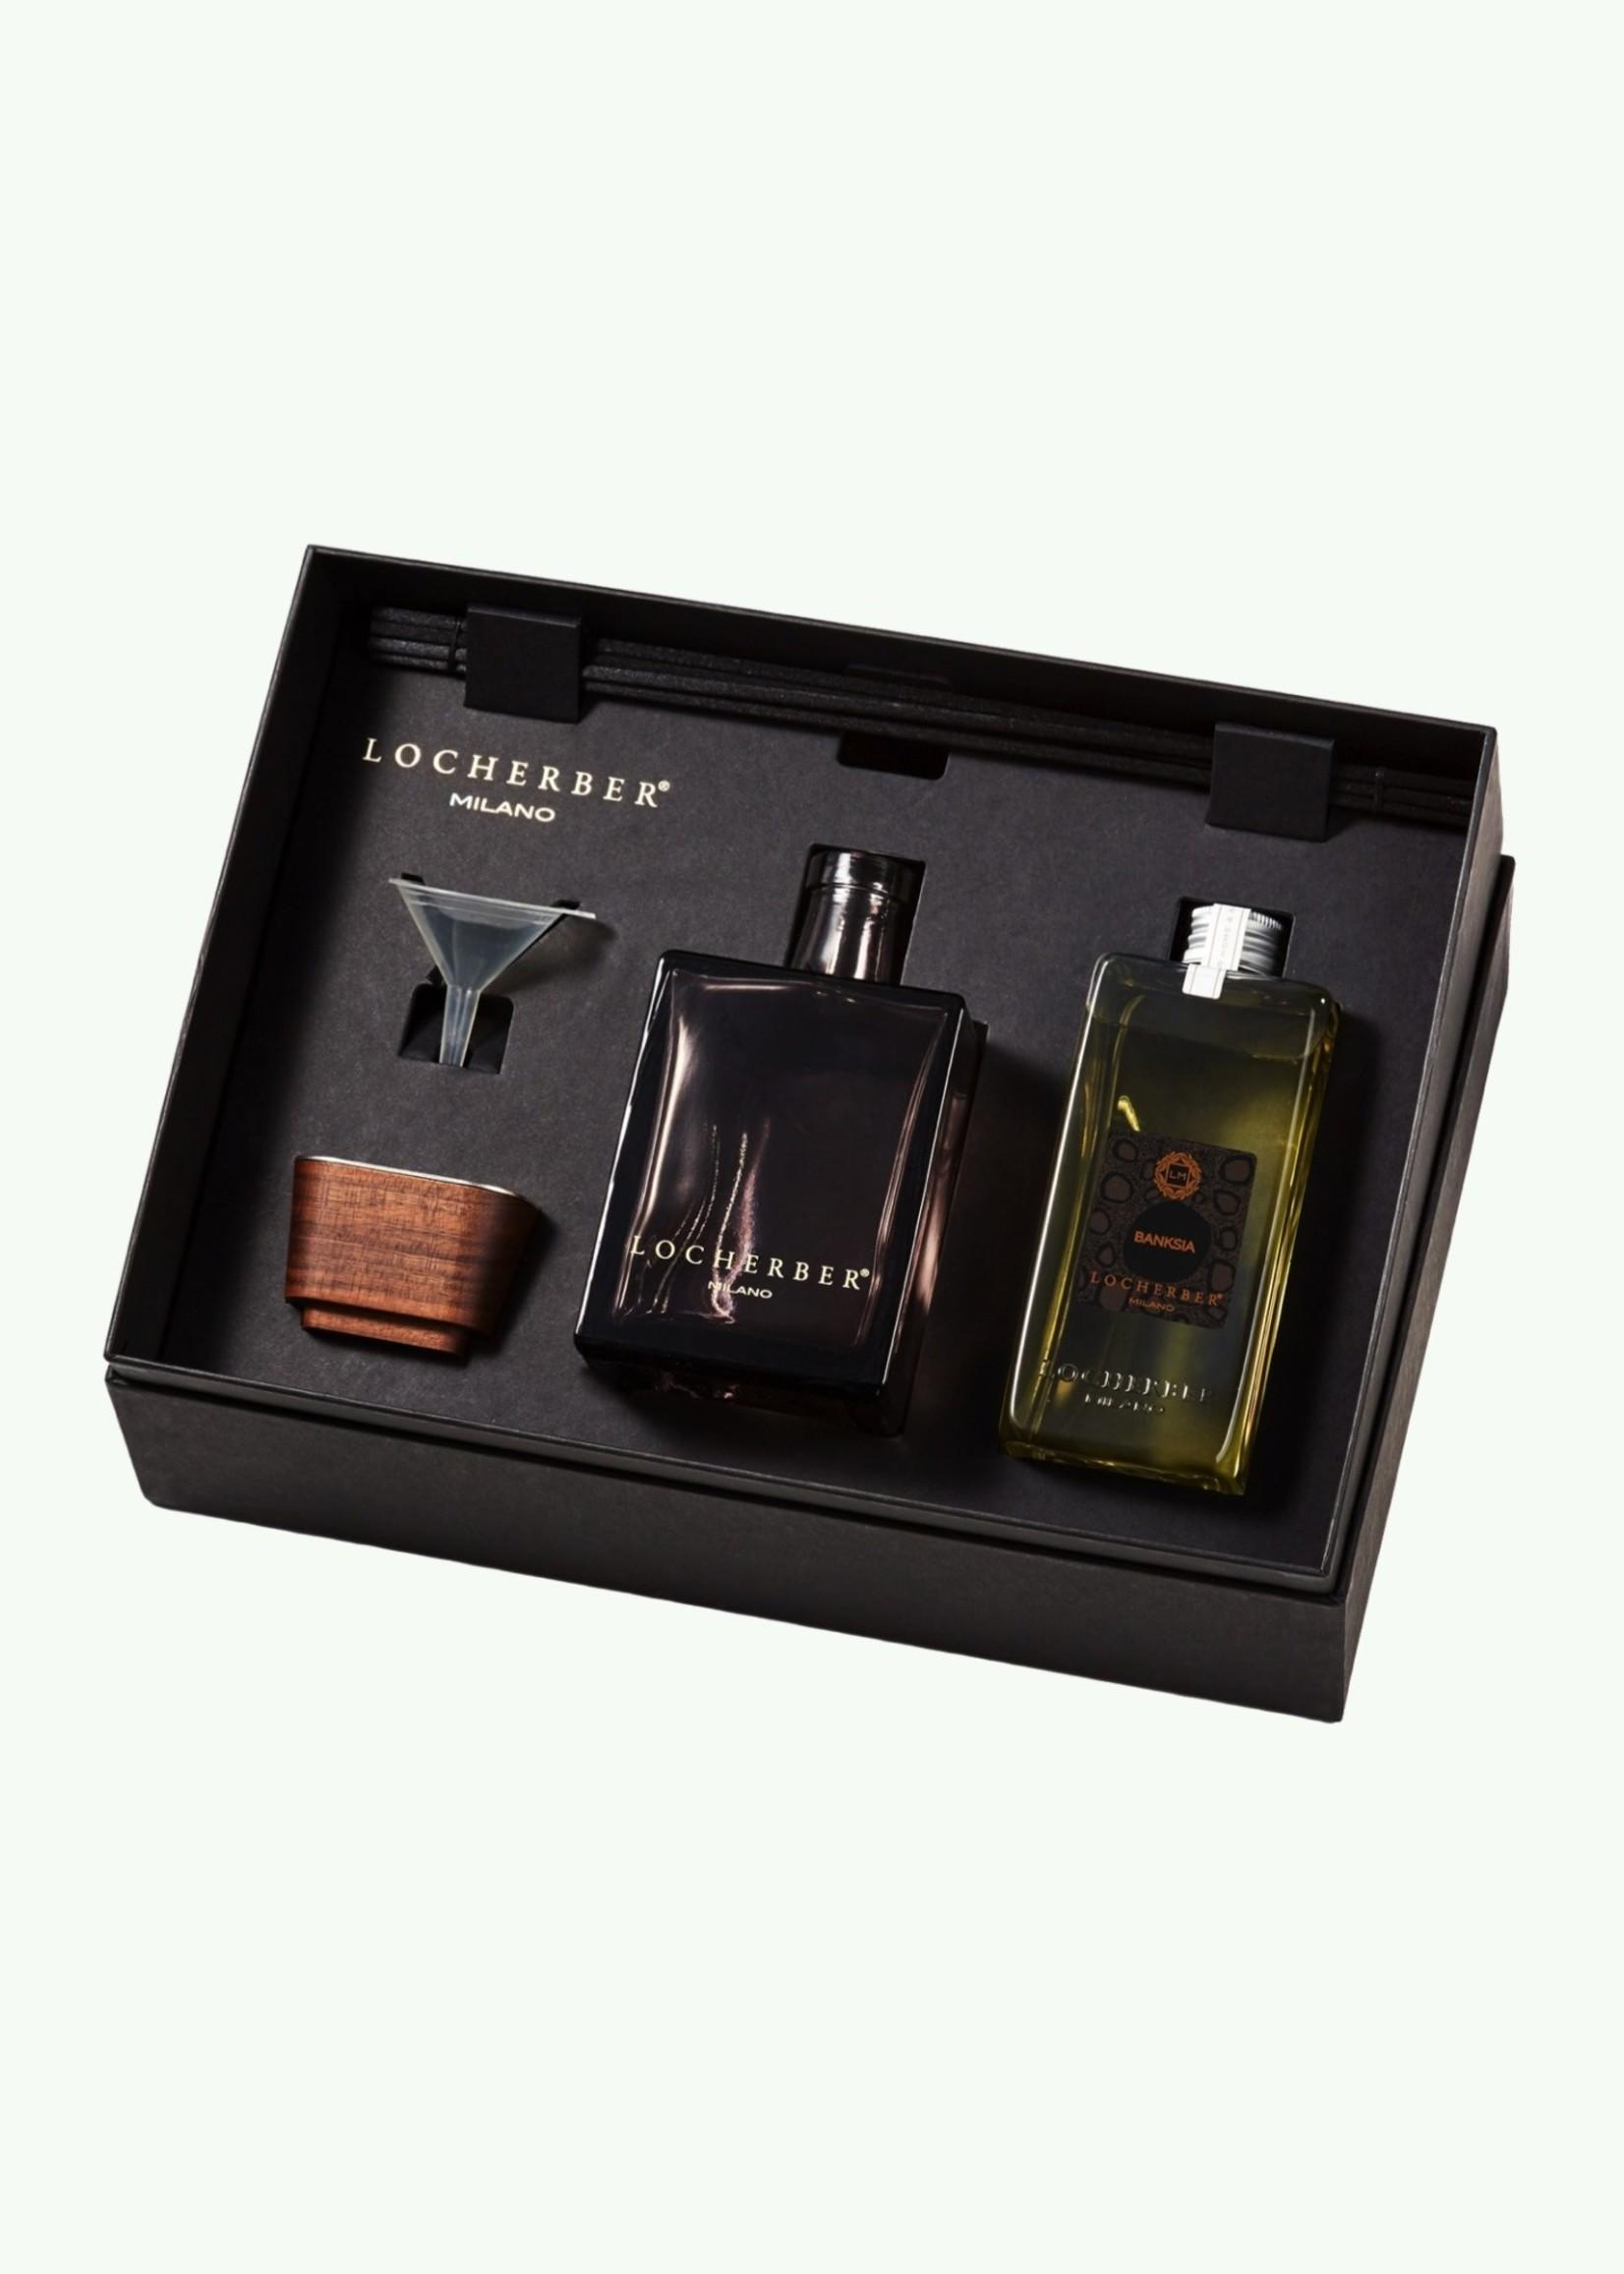 Locherber Locherber Milano - Banksai - Diffuser Gift Set